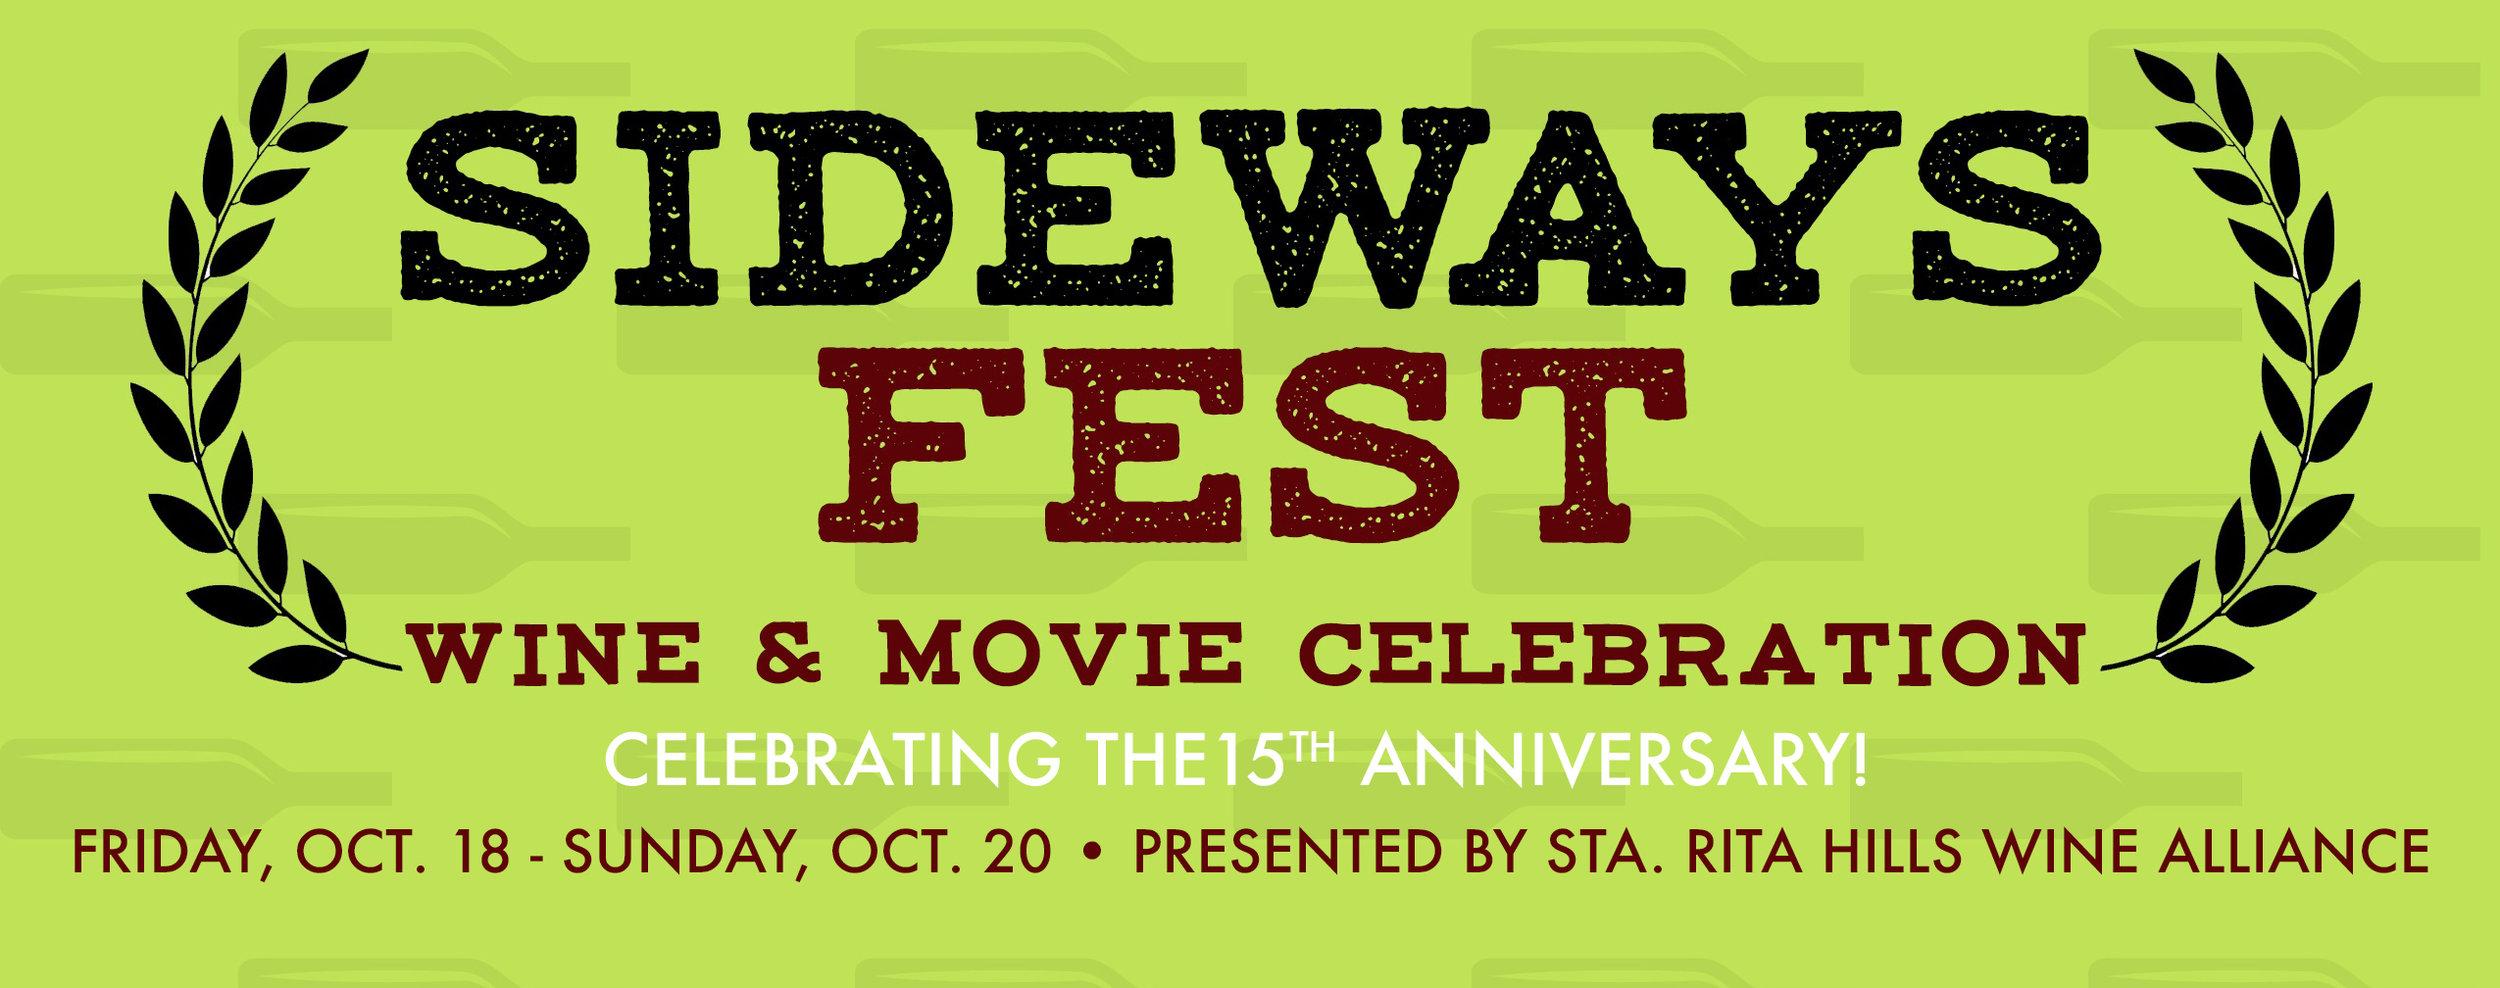 sidewaysfest logo film look-2 (1).jpg